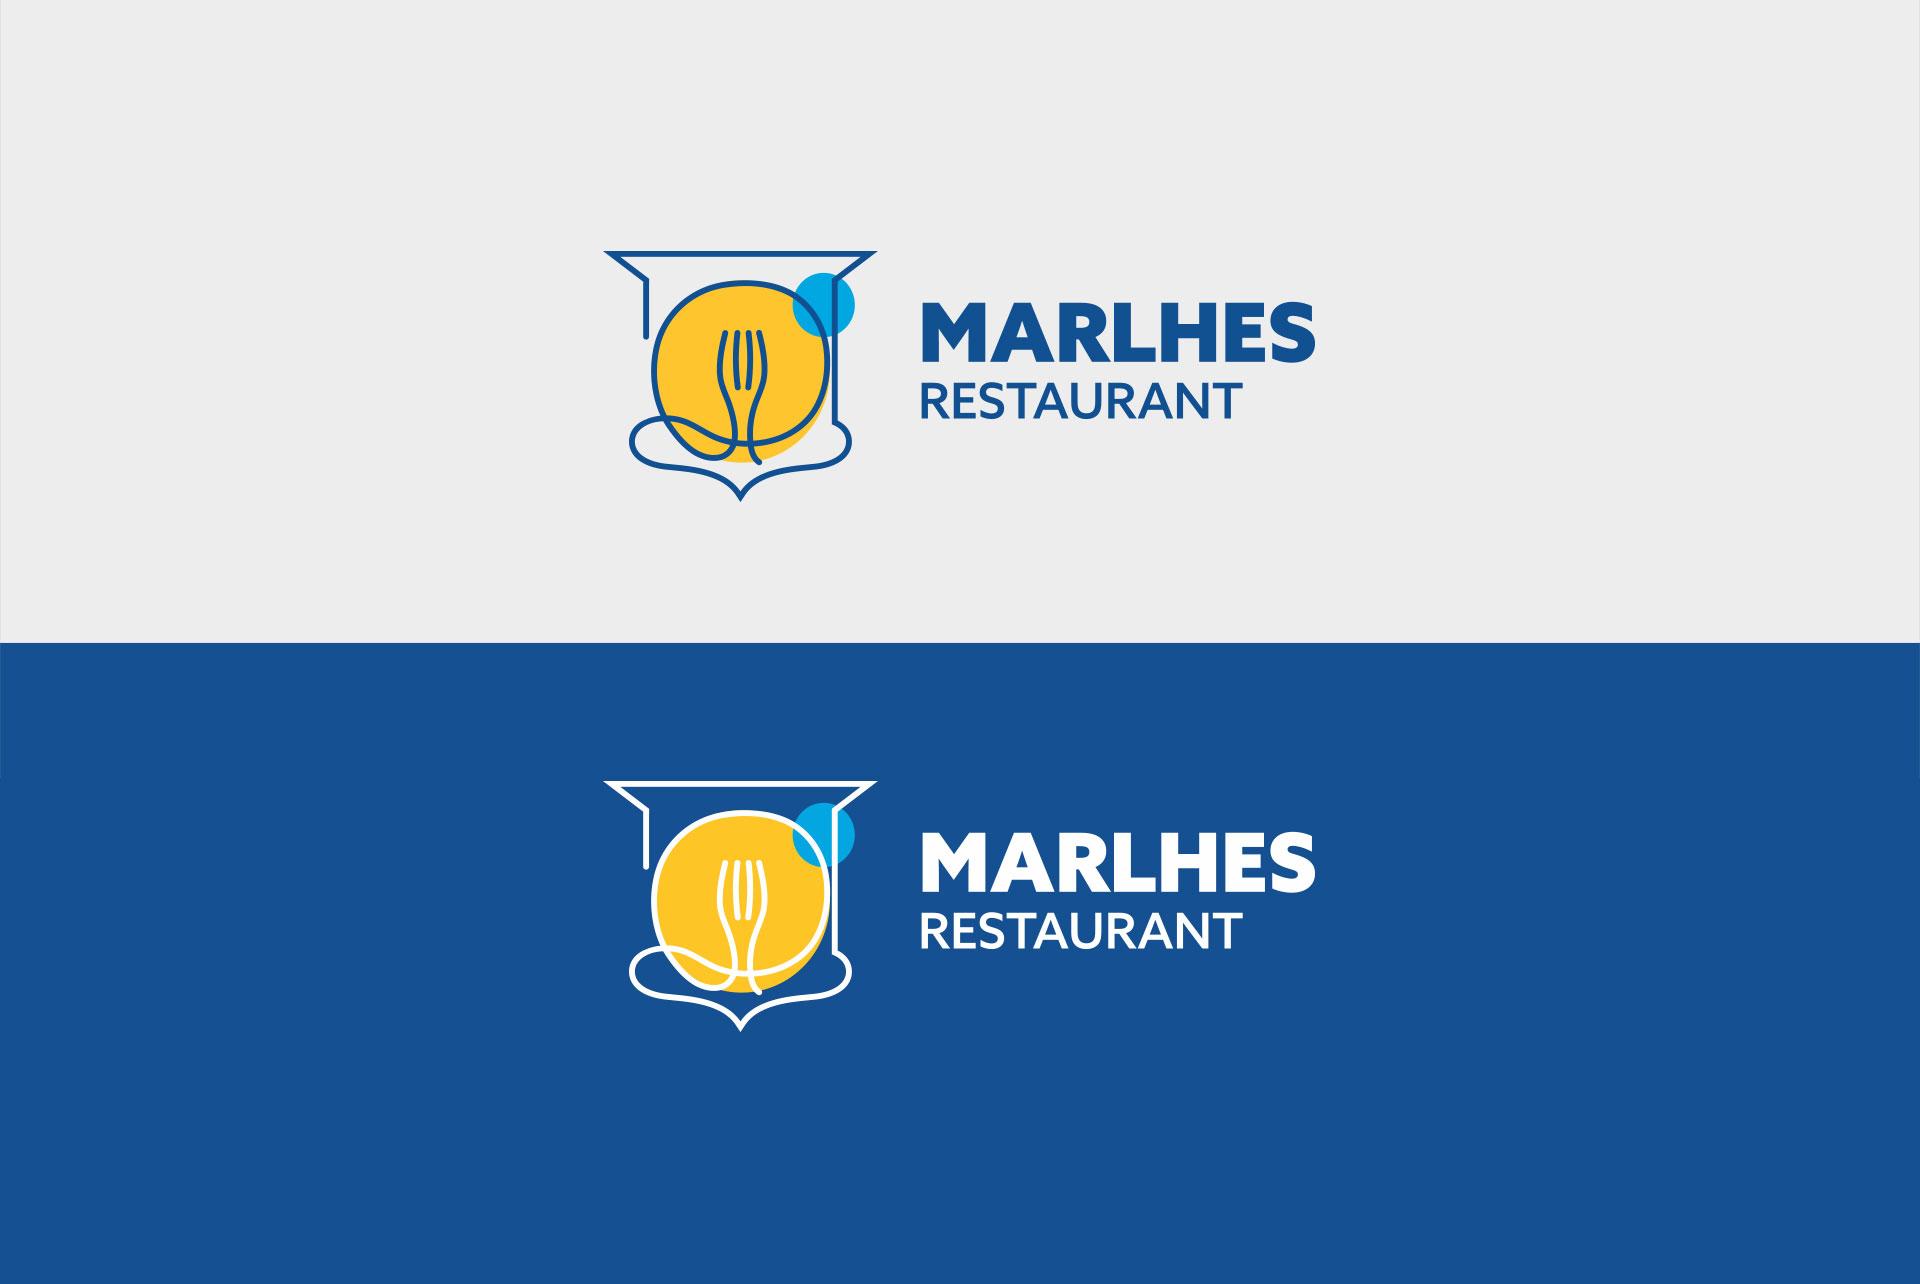 Assumption College Marhles Restaurant